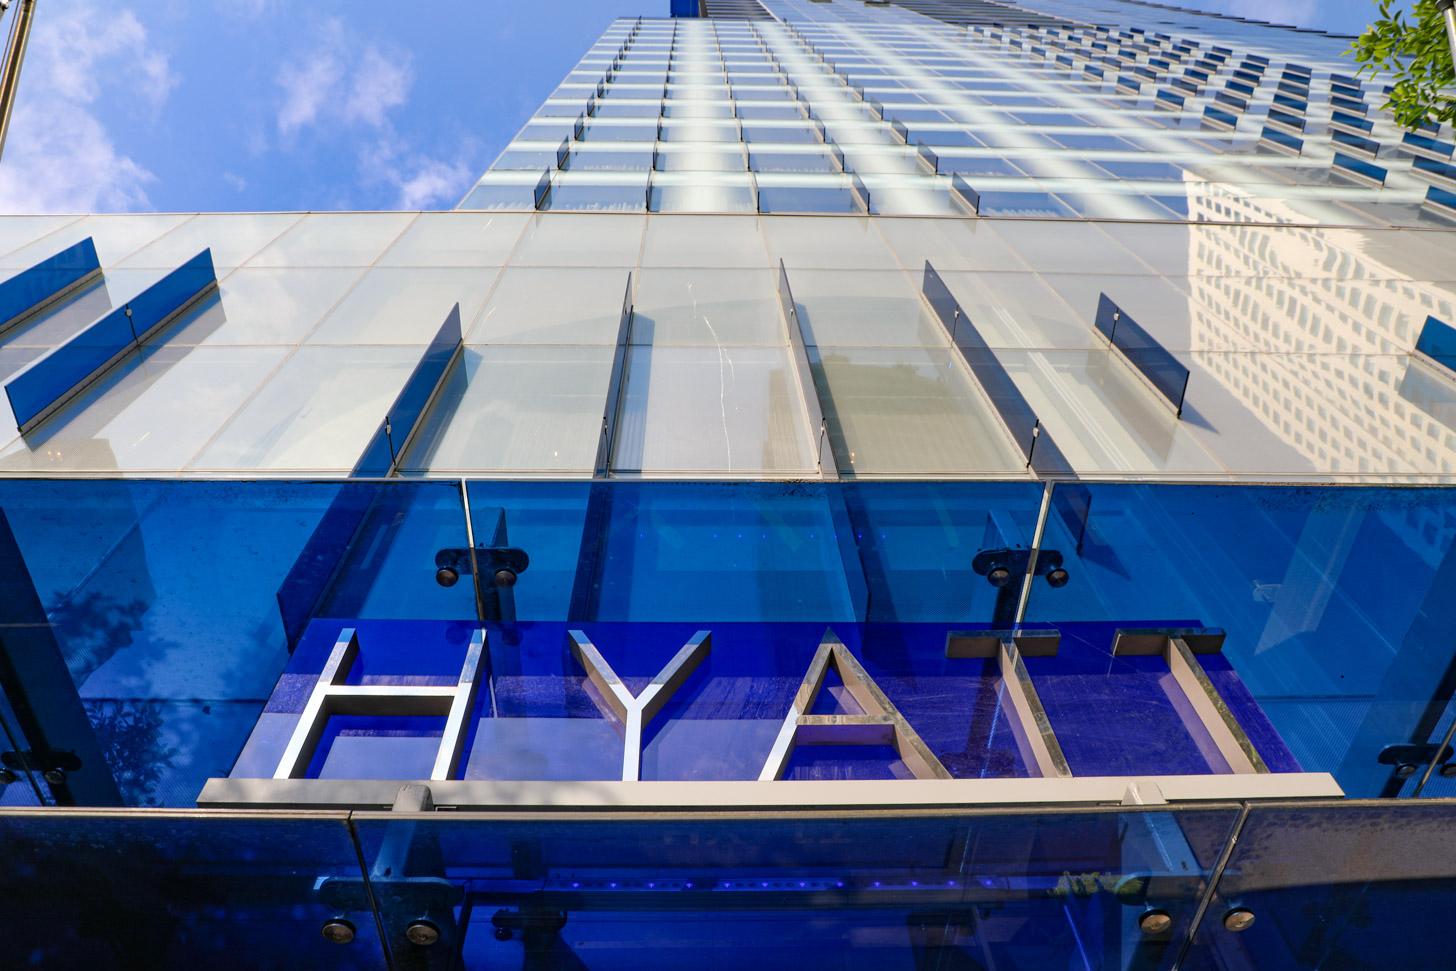 Hyatt at Olive 8